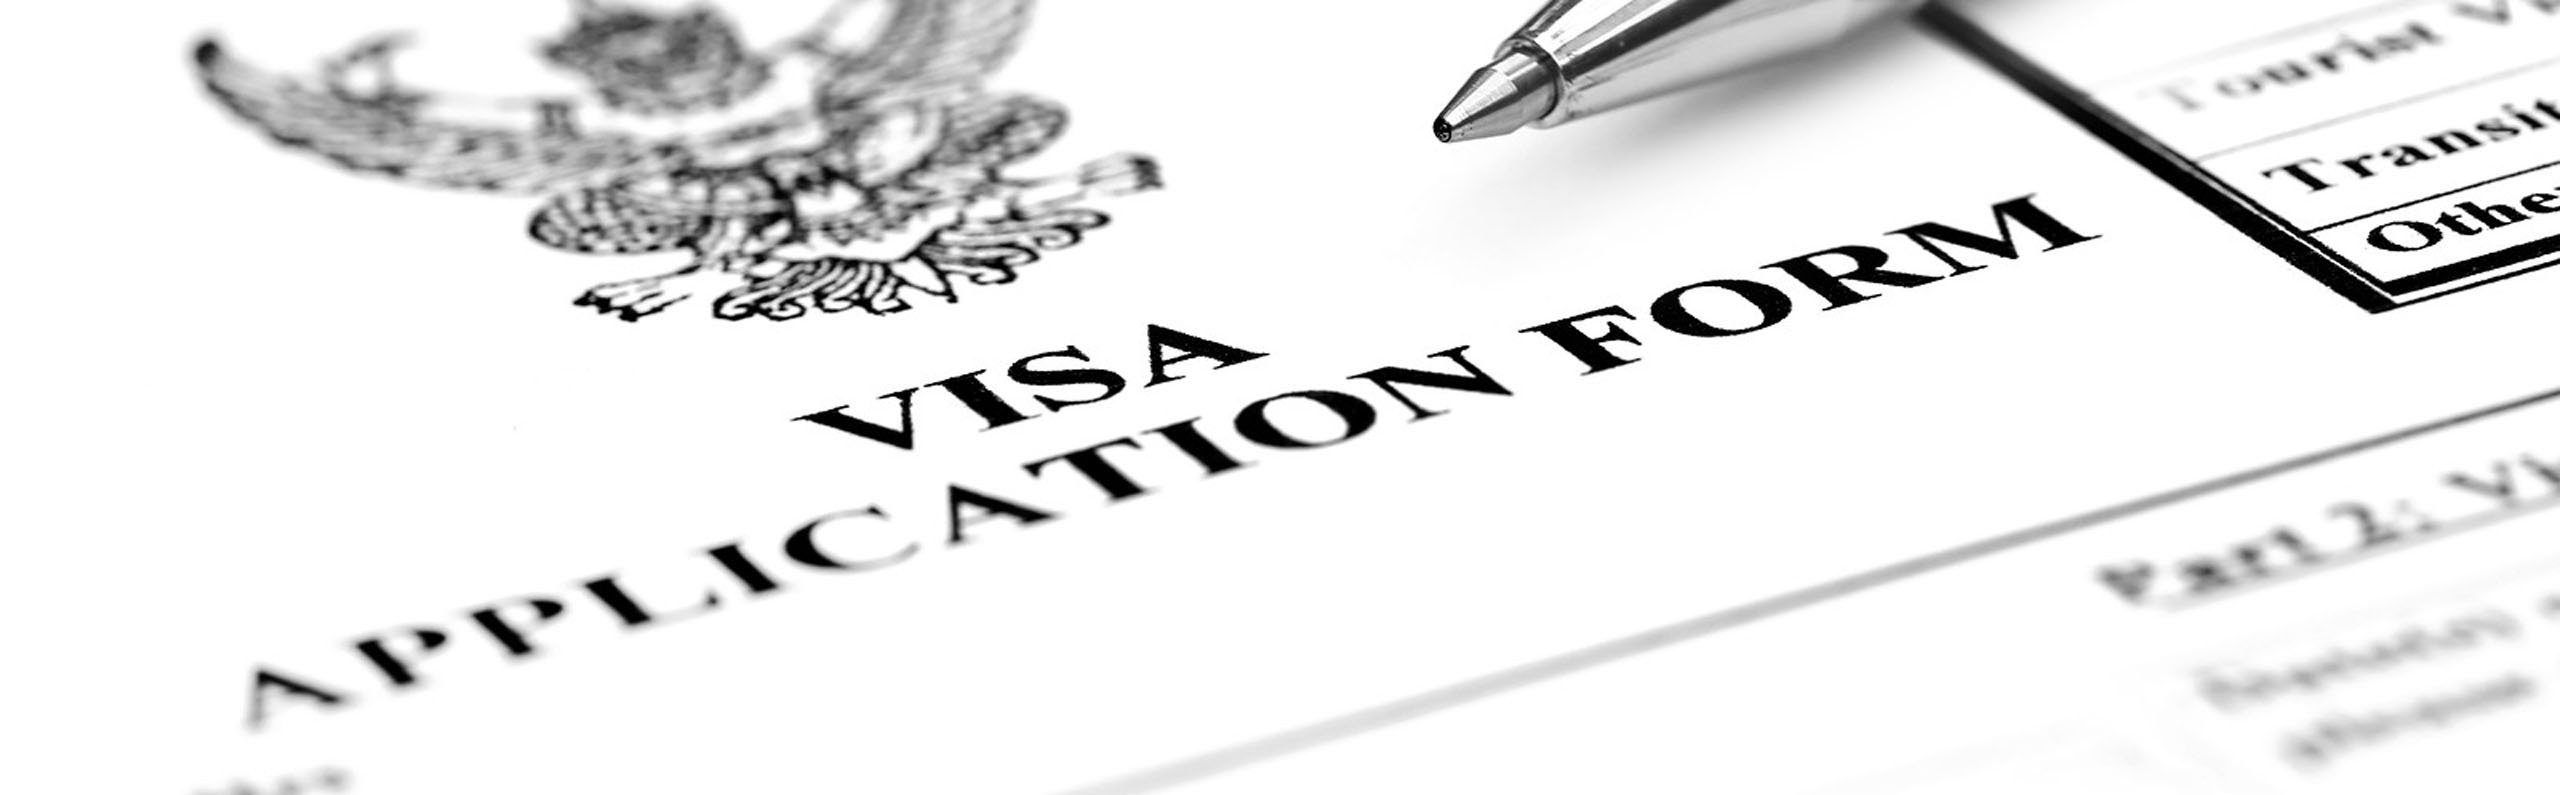 How to get a Cambodia Visa